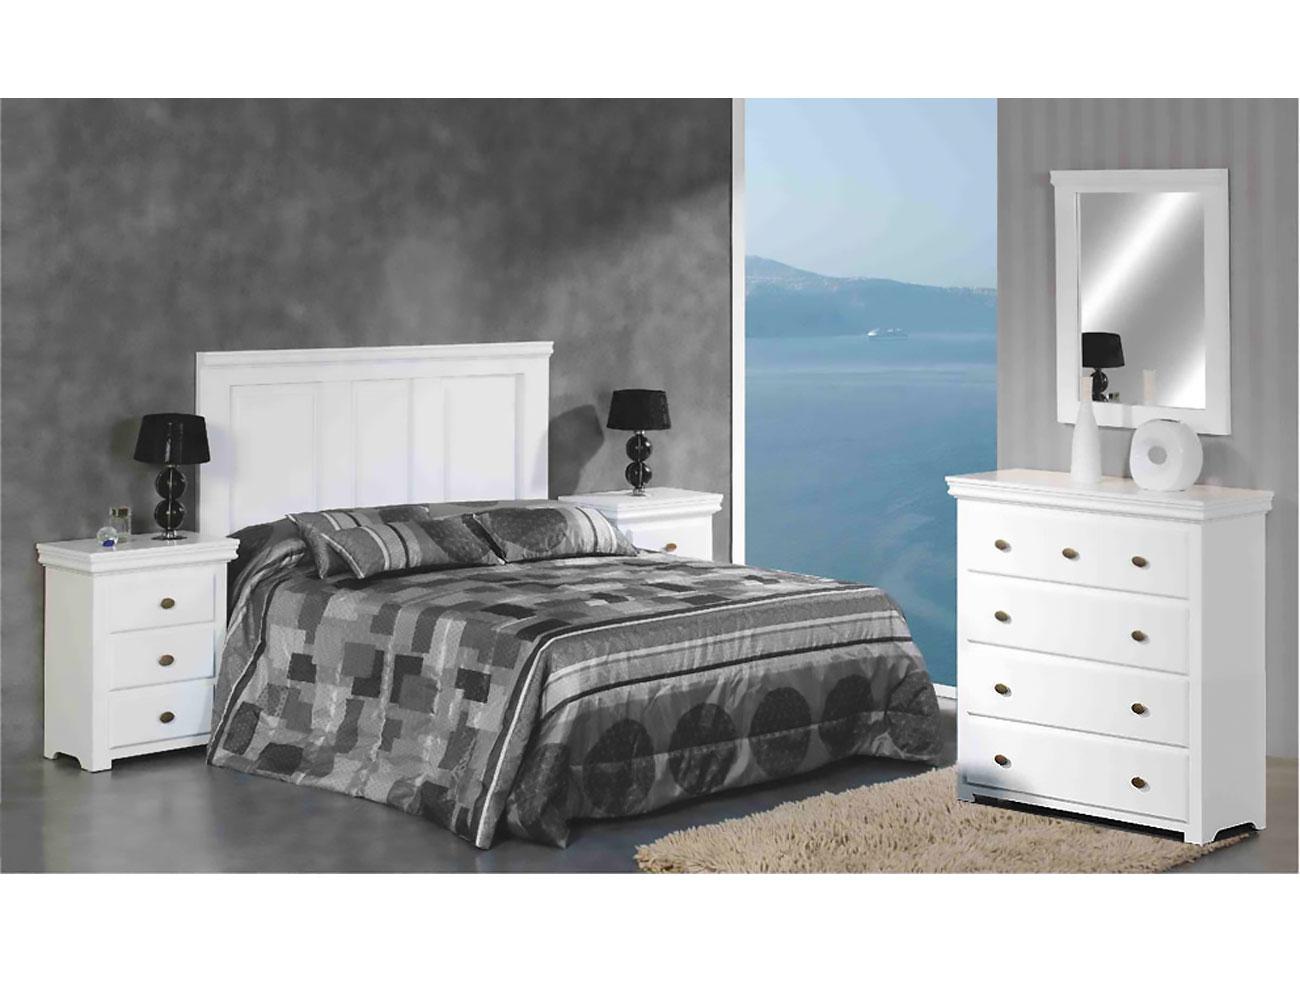 Dormitorio matrimonio comoda 5 c madera dm lacado blanco14